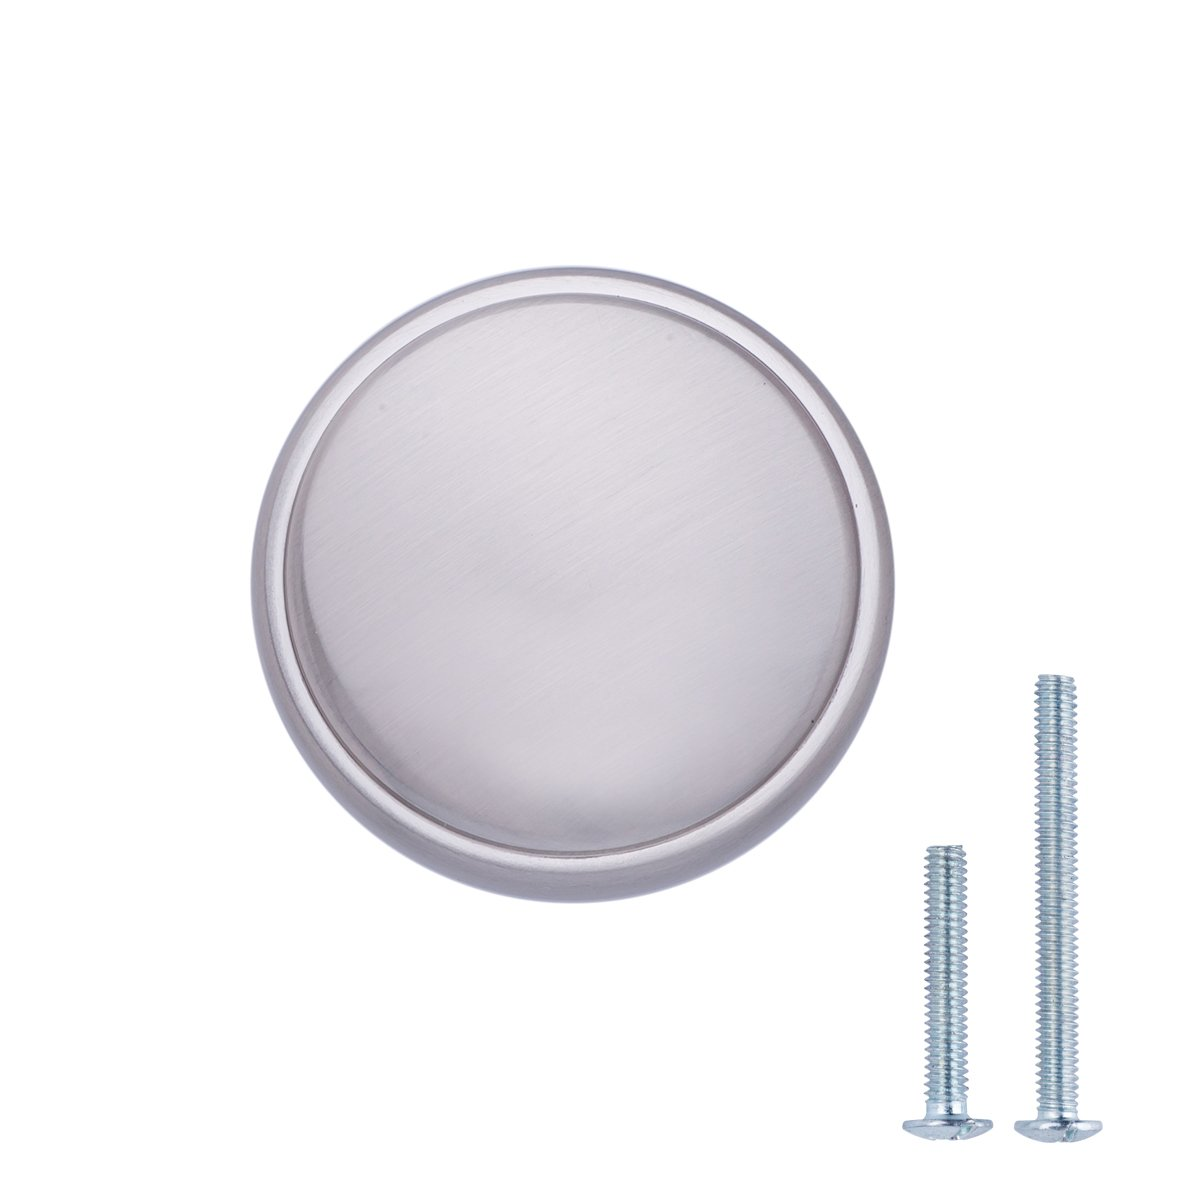 AmazonBasics Modern Wide Top Ring Cabinet Knob, 1.52'' Diameter, Satin Nickel, 10-Pack